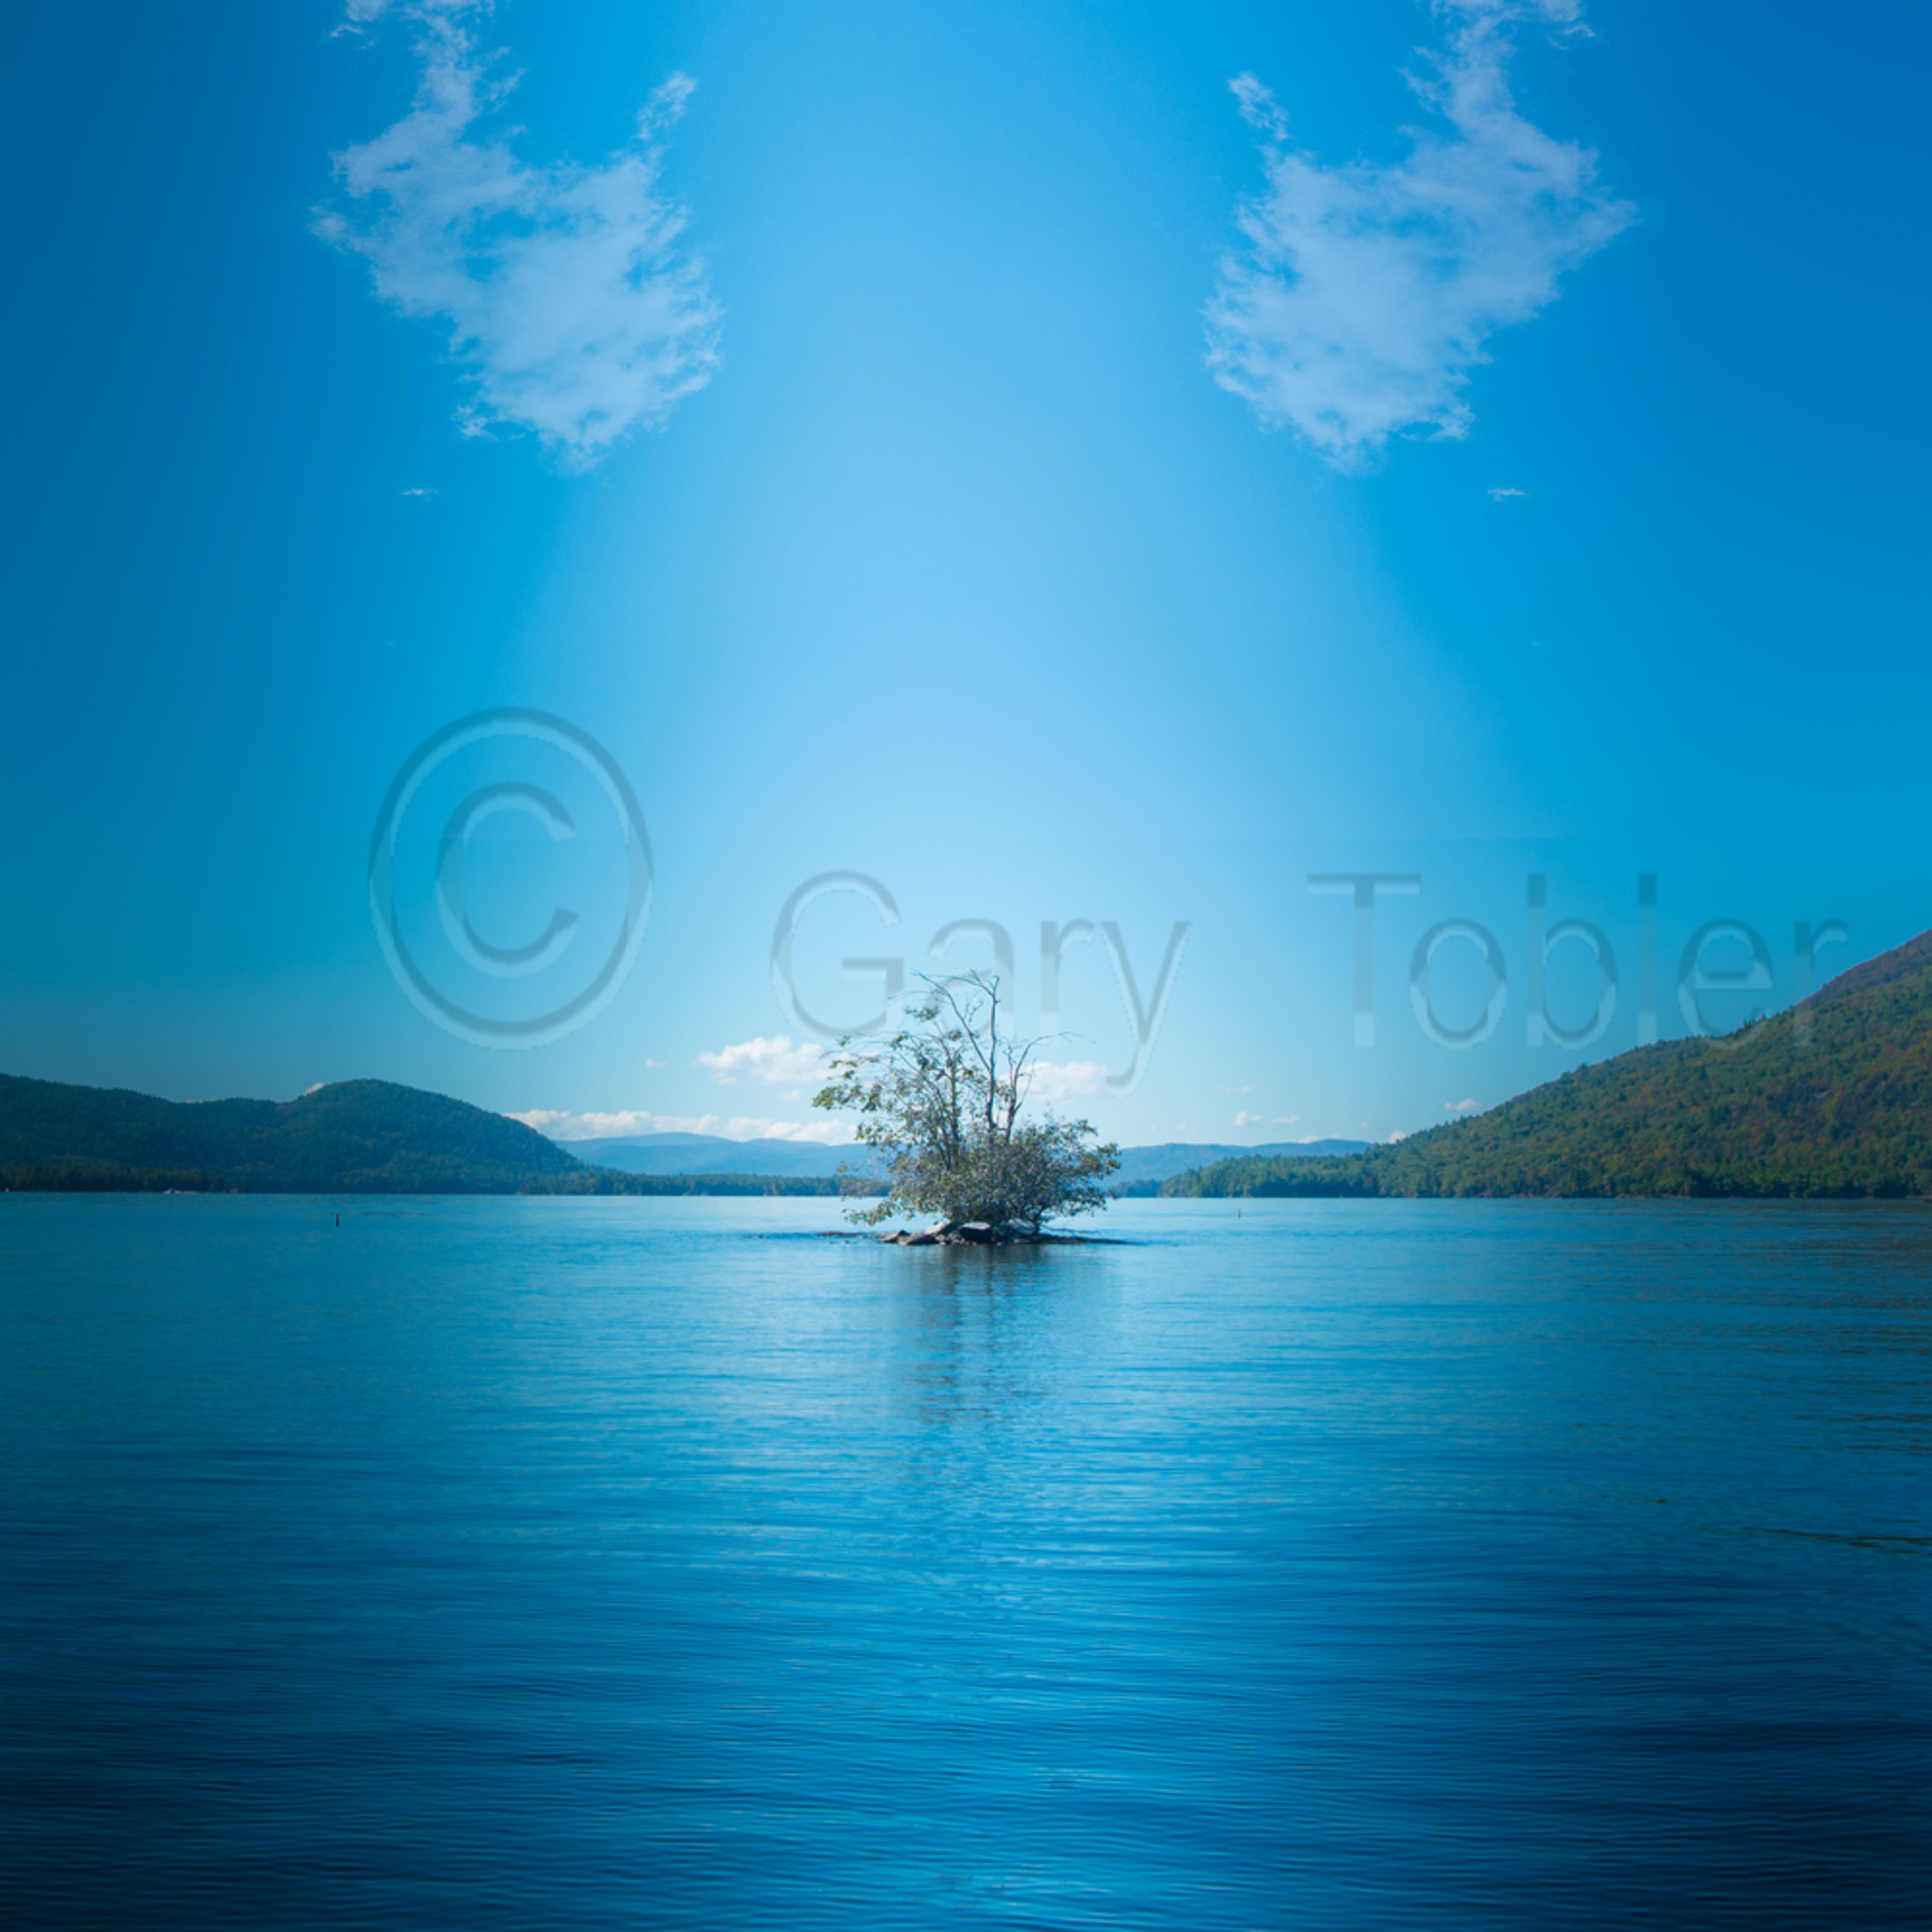 Spirt of lake george zh7qbq